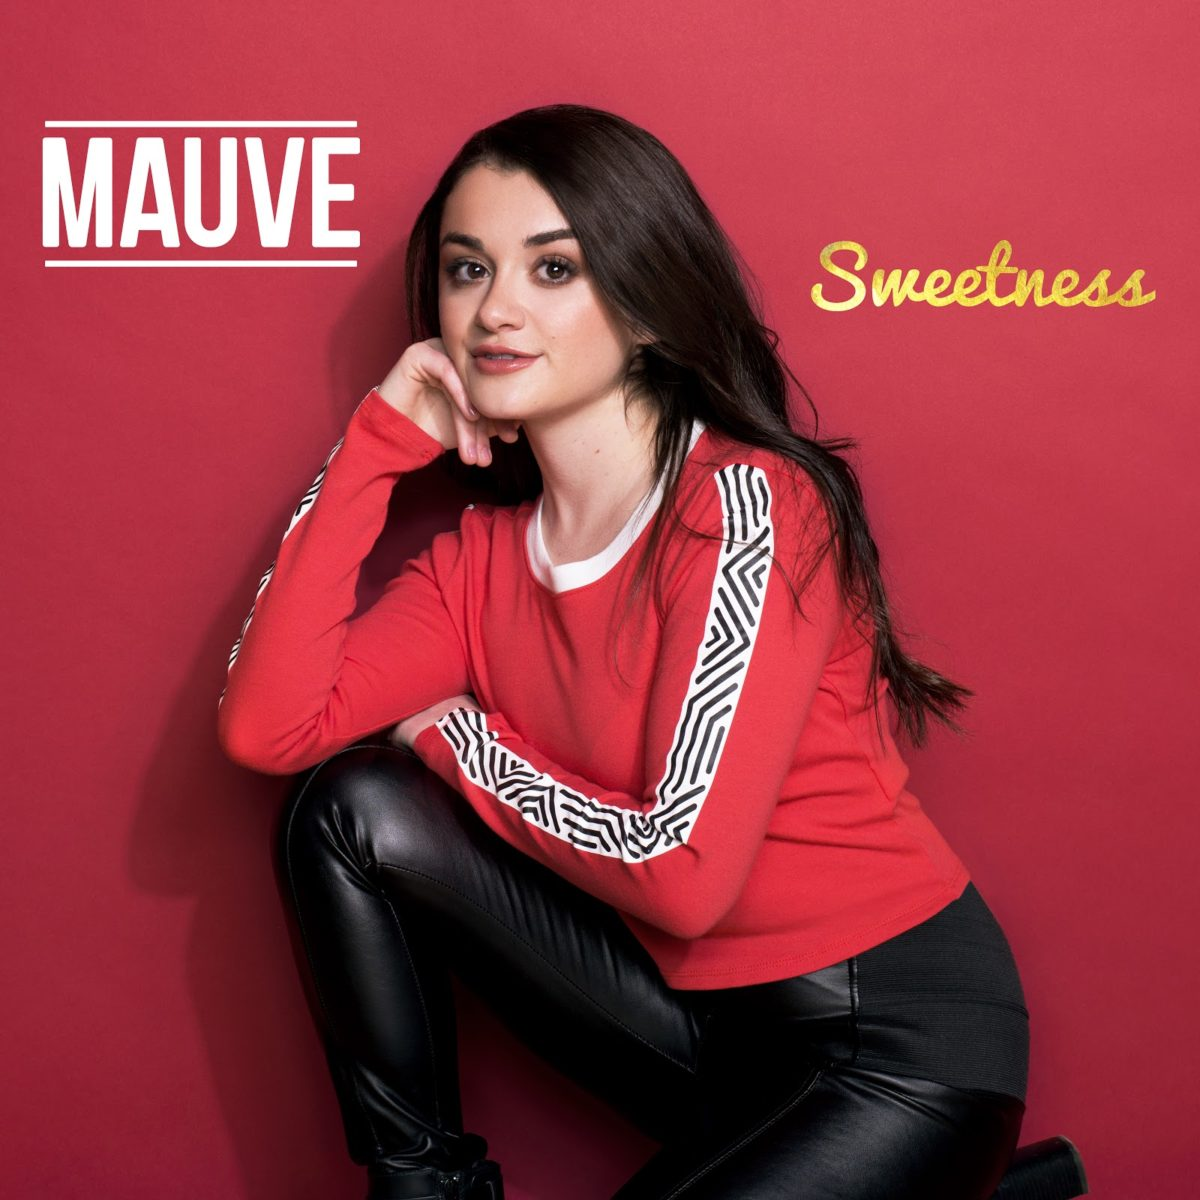 Mauve – Sweetness